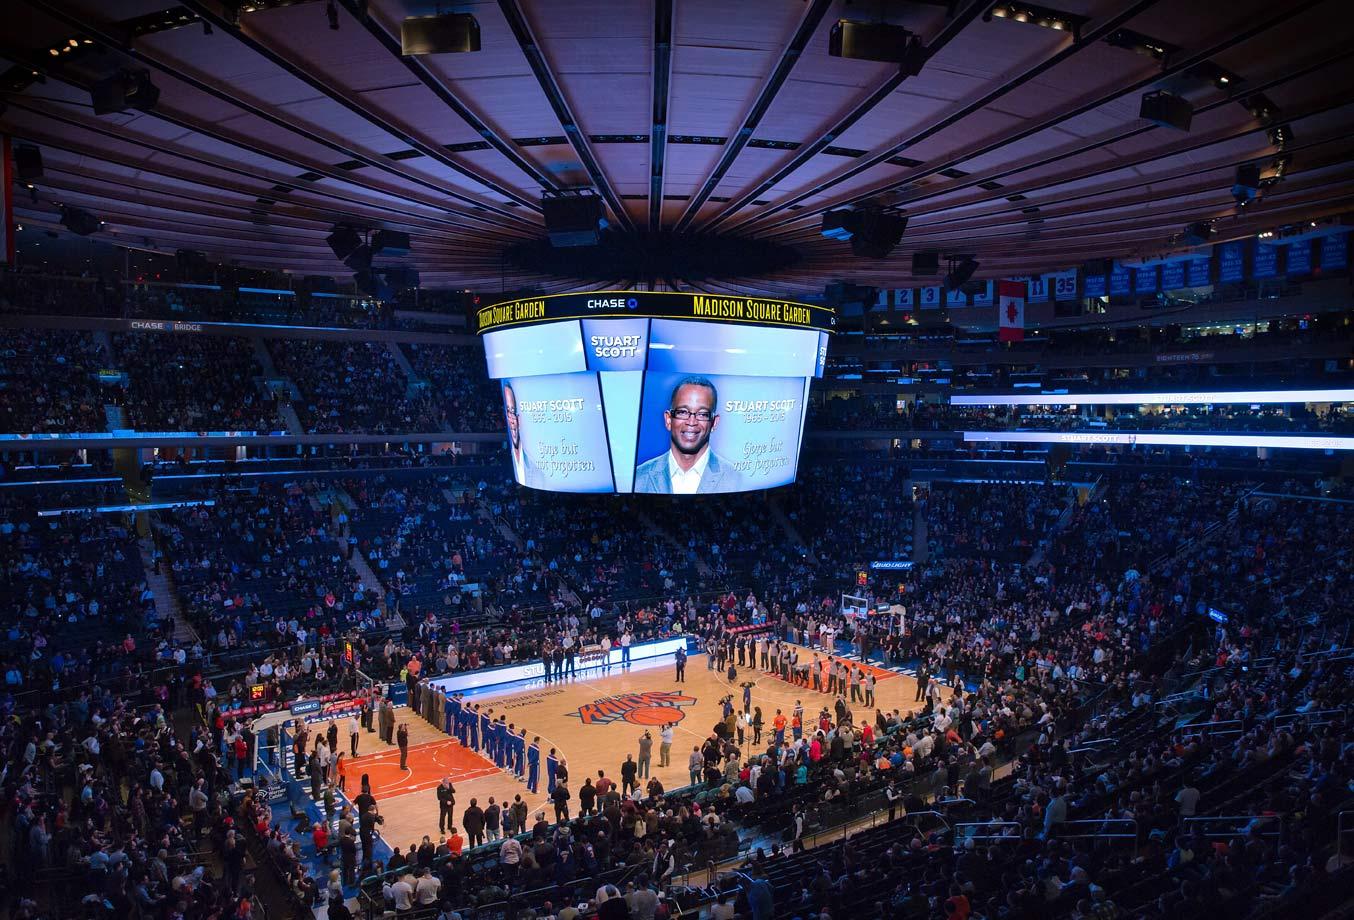 Stuart Scott is honored before the New York Knicks game against the Milwaukee Bucks at Madison Square Garden on Jan. 4, 2015 in New York City.